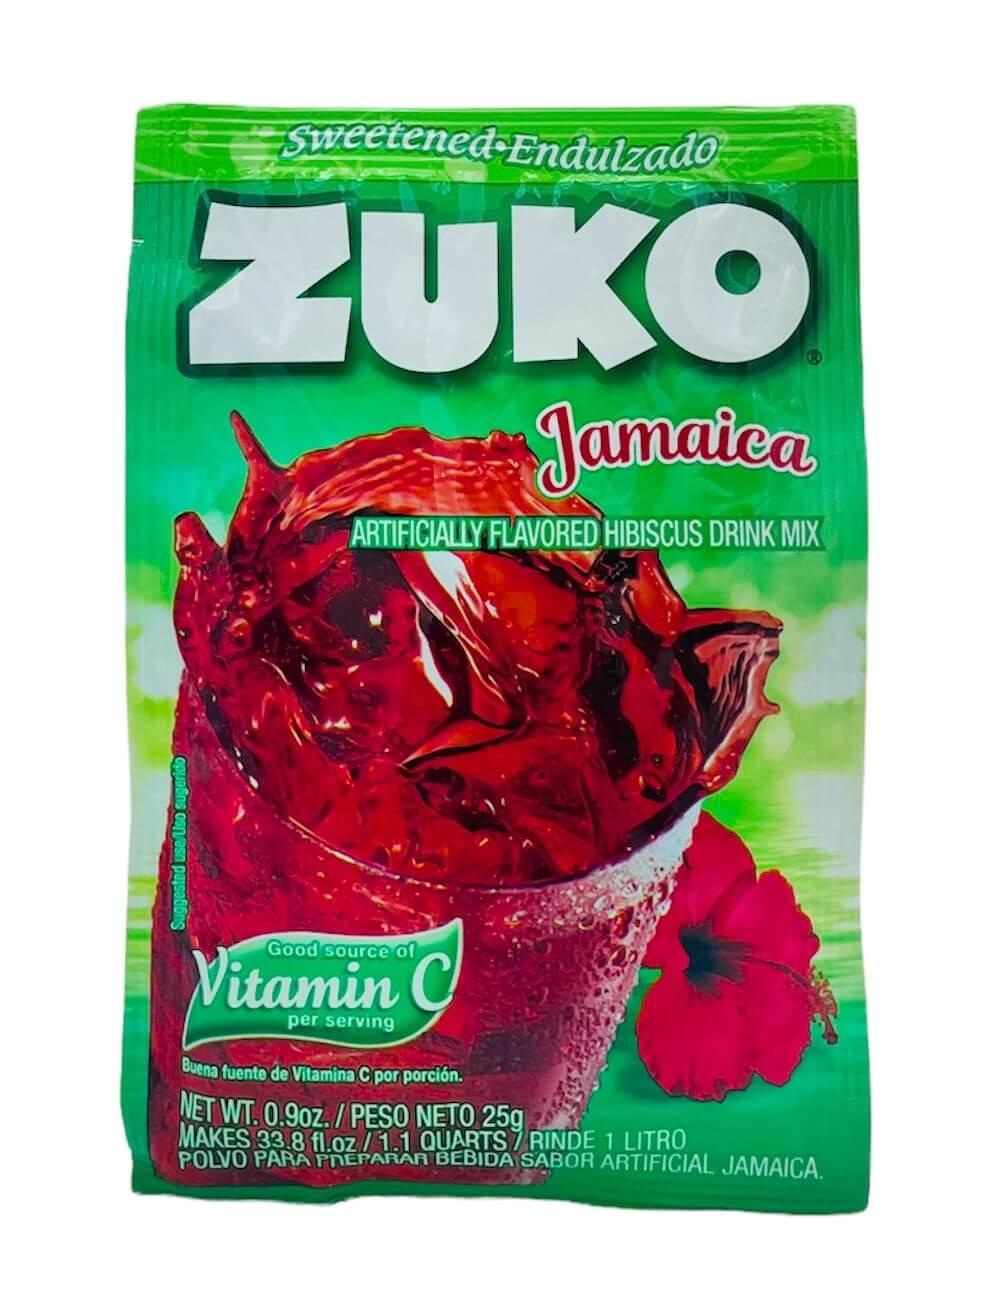 Picture of Zuko Hibiscus - Jamaica Flavor Drink Mix (1 Liter / 0.9 oz) 3 Pack- Item No.30108-00018